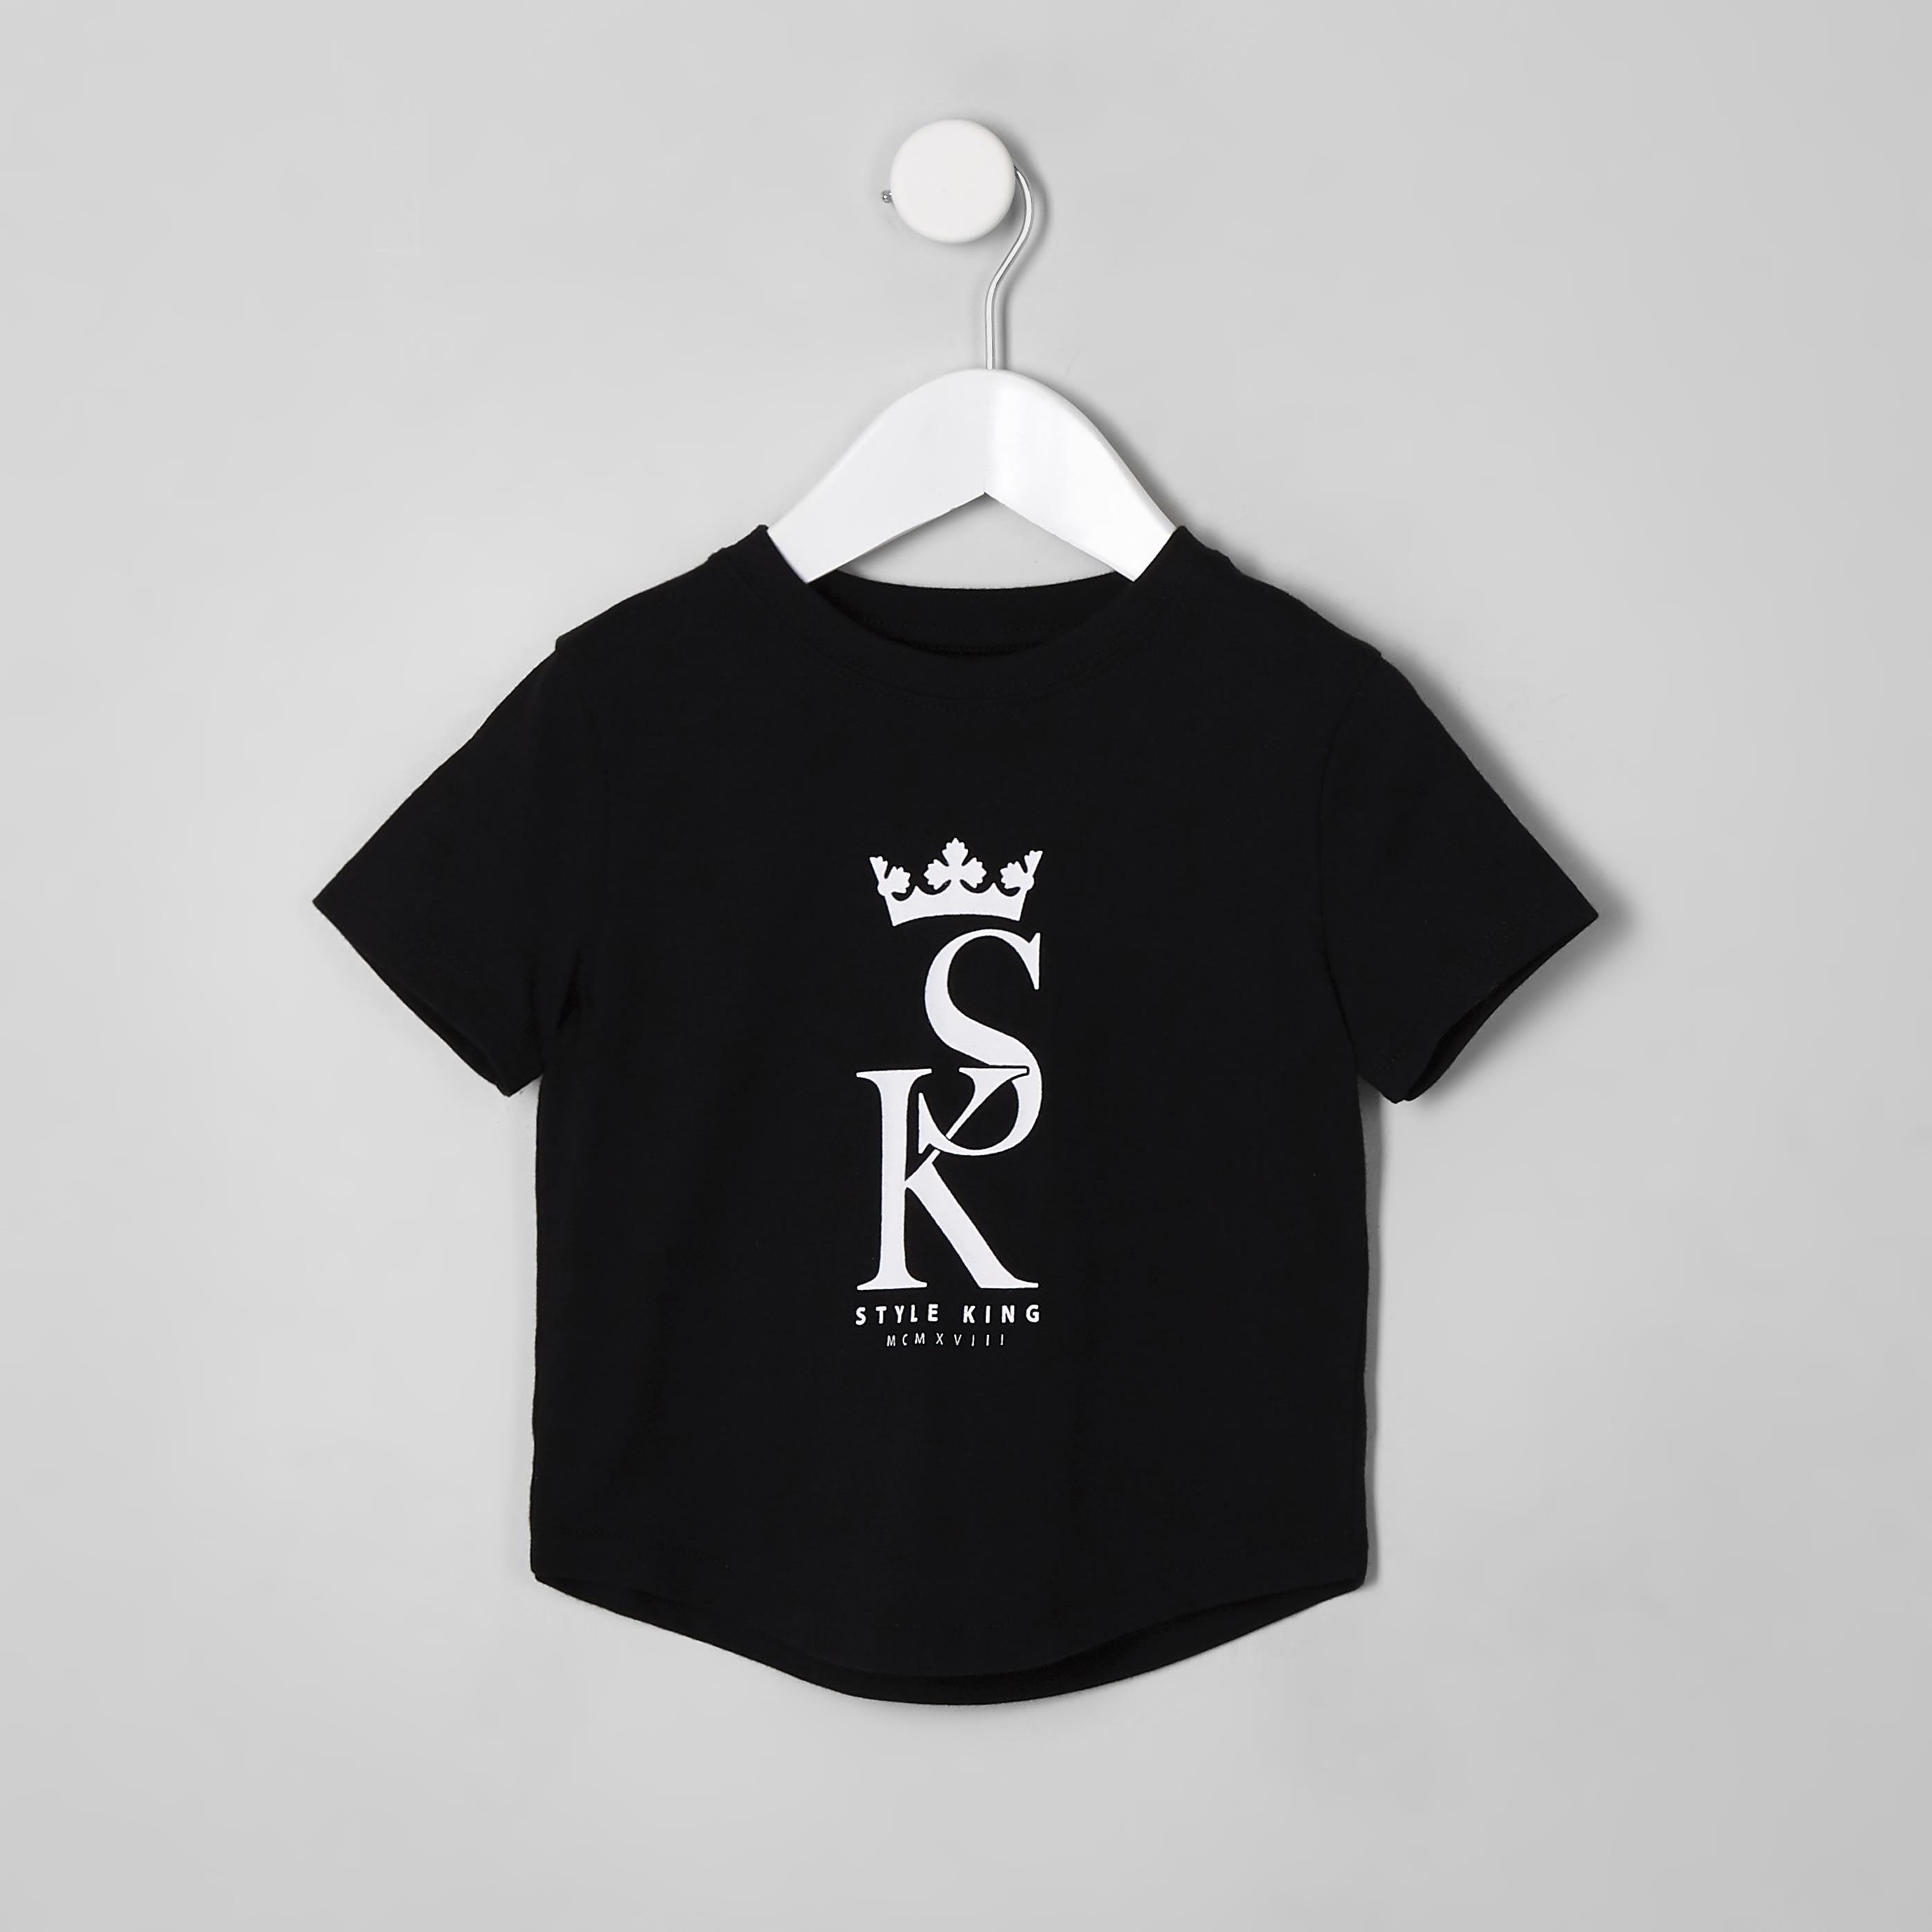 River Island Mens Baby Boys Black 'style king' T-shirt (0-3 Mths)